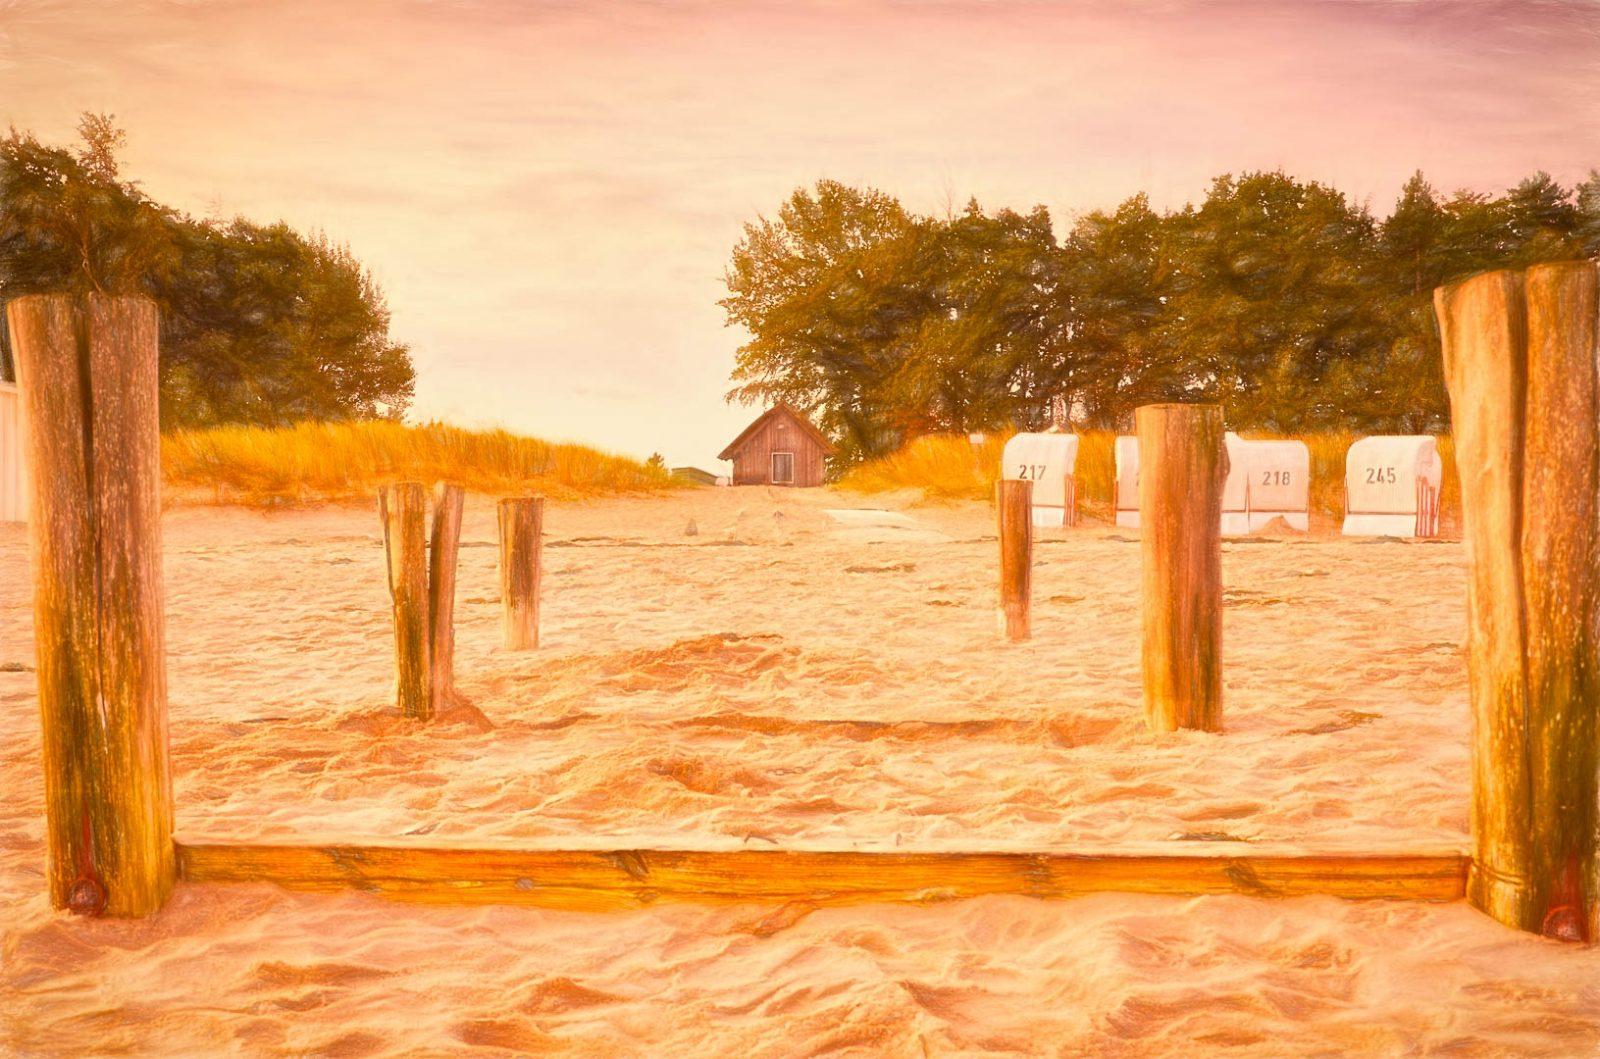 buy fine art print painterly paintography photo photography photographer zingst germany